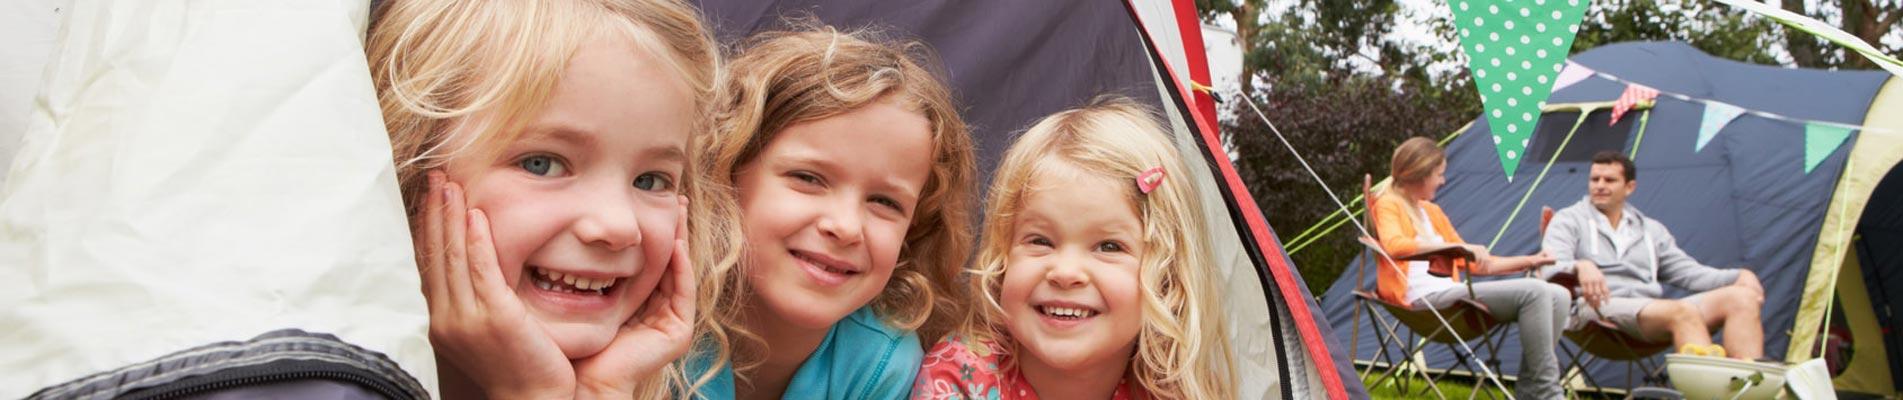 camping en bretagne promotions